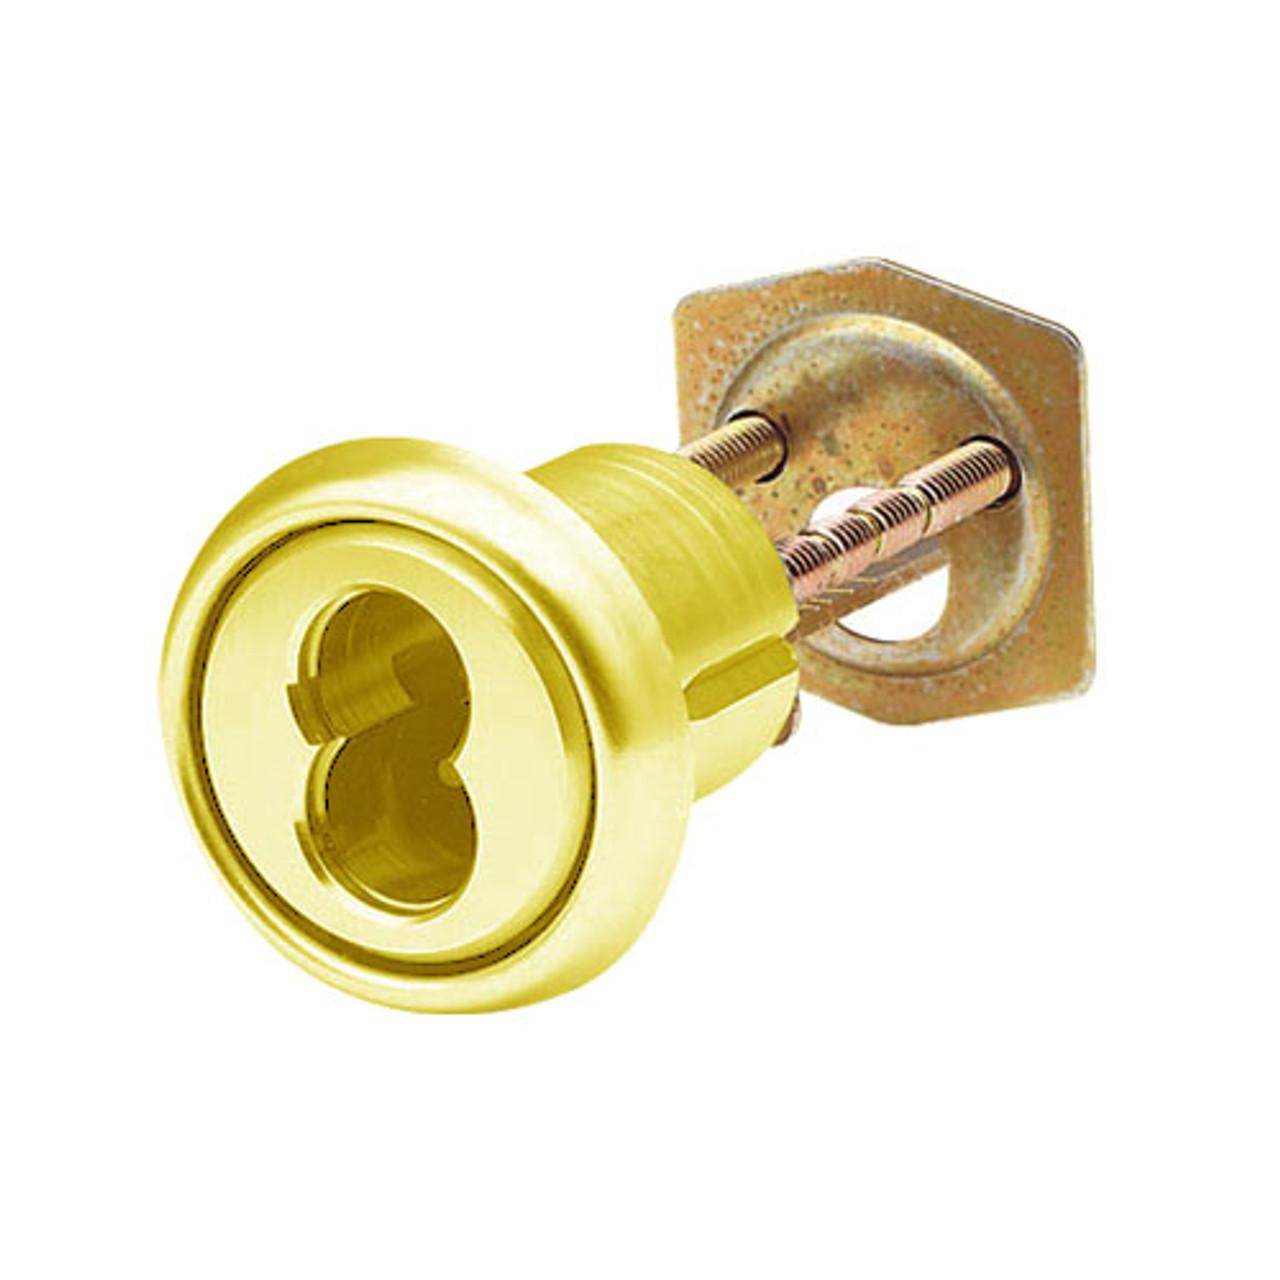 16RCR-16-03 Arrow Lock Rim Interchangeable Cylinder 6 Pin Housing in Bright Brass